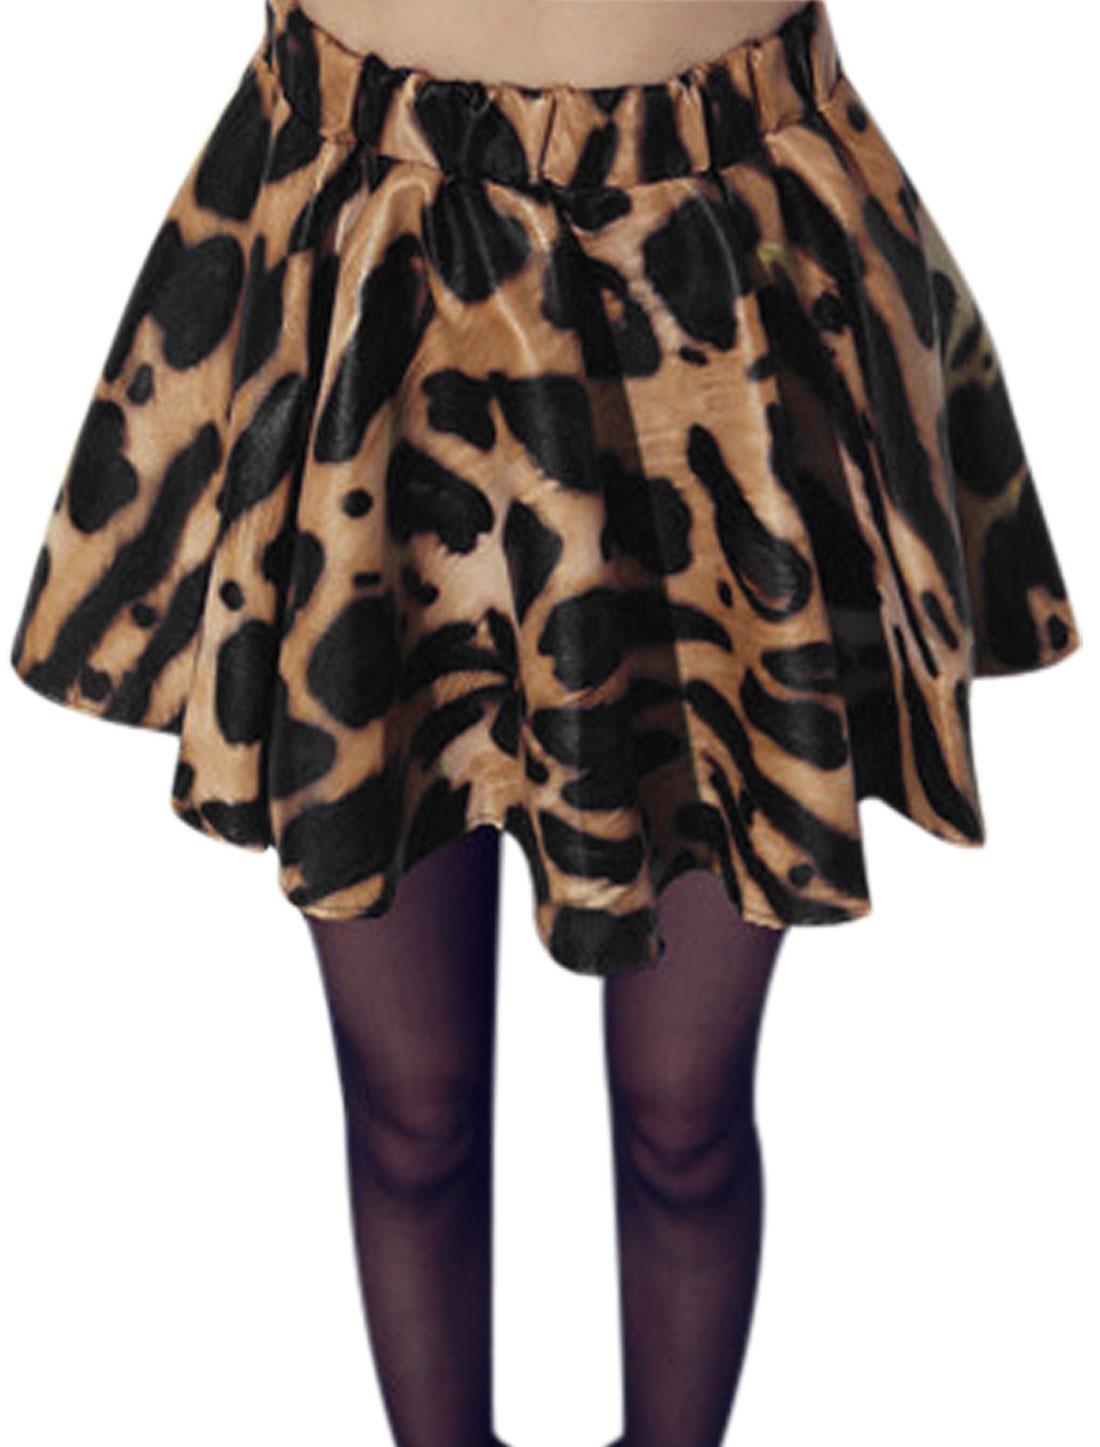 Women Leopard Prints Elastic Waist Imitation Leather Skirt Black Camel M